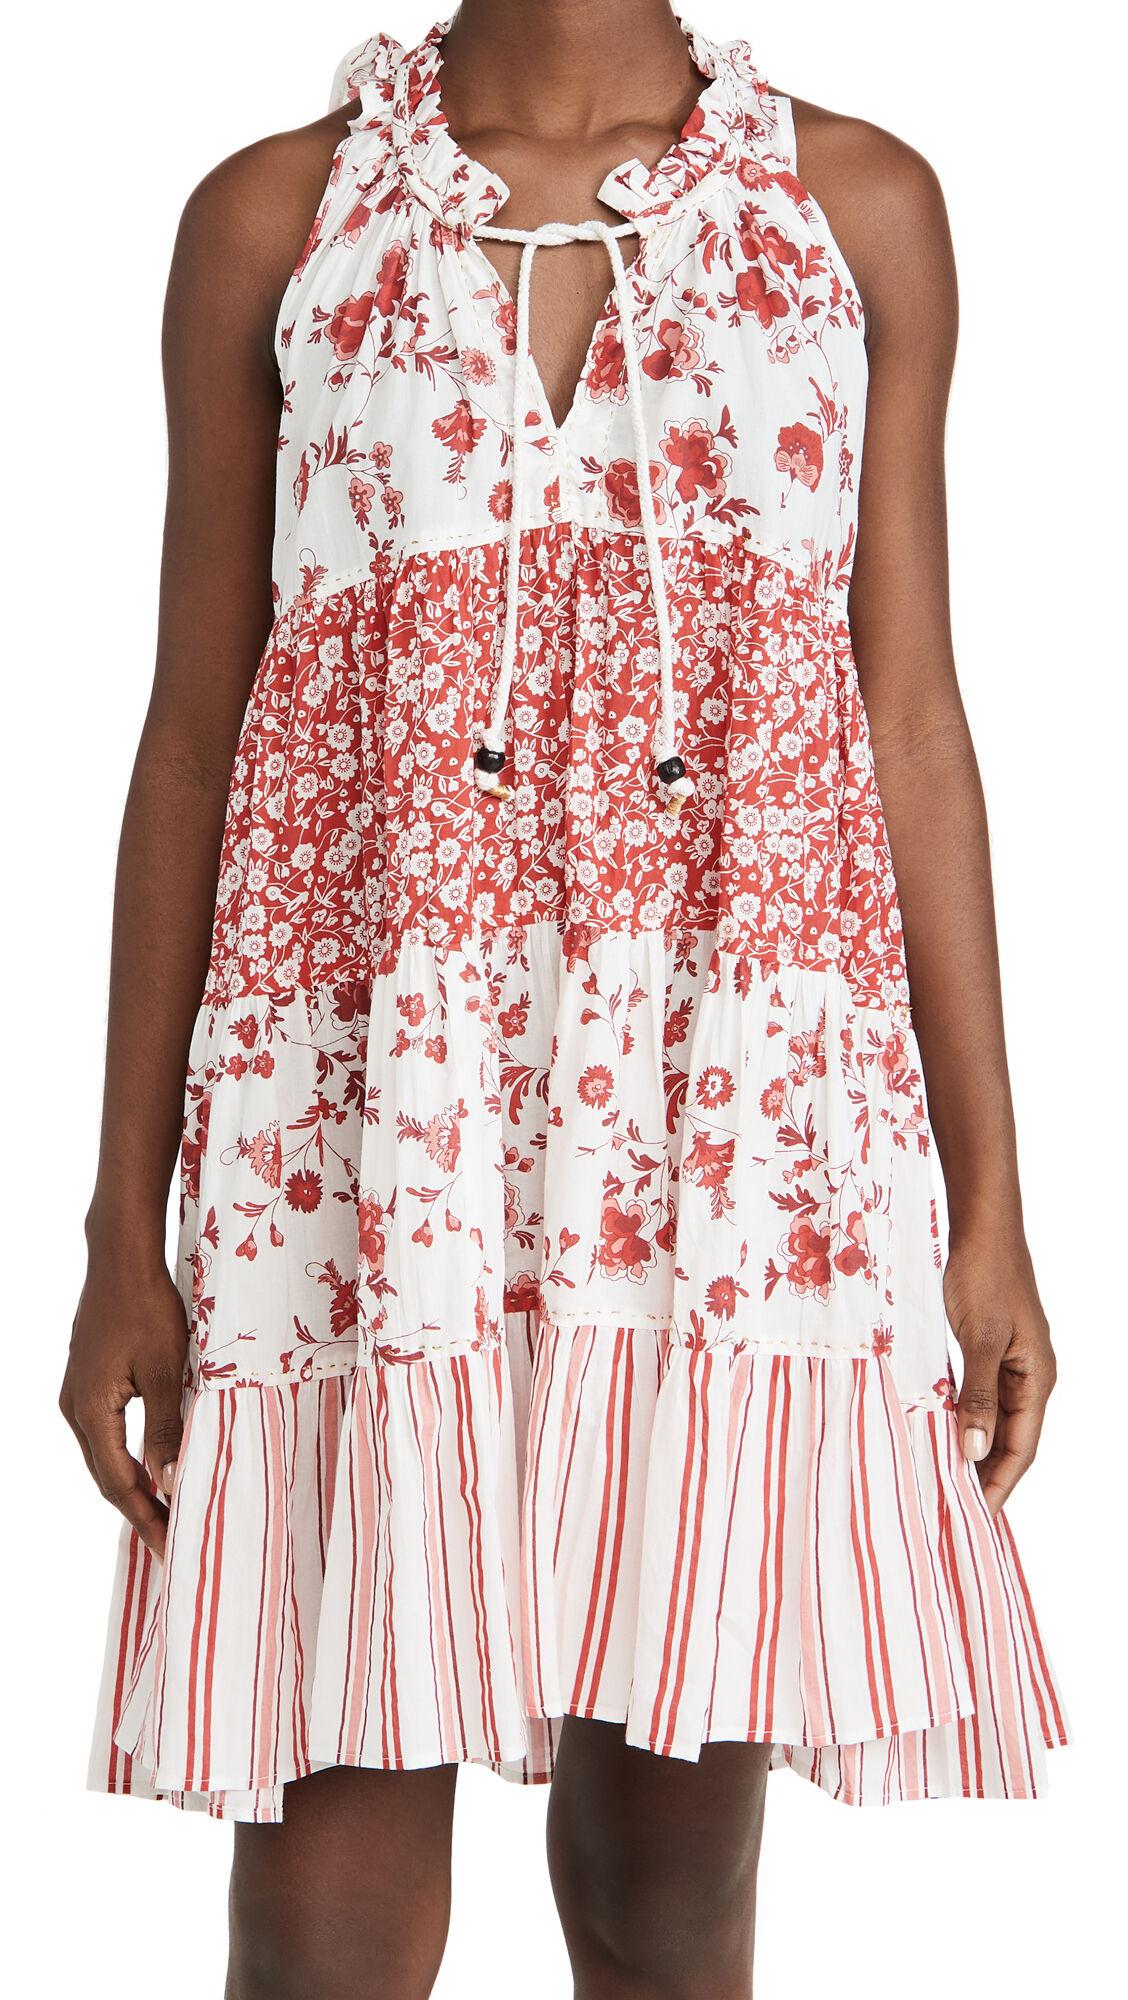 Ro's Garden Sofia Short Dress  - Provence Red - Size: Medium